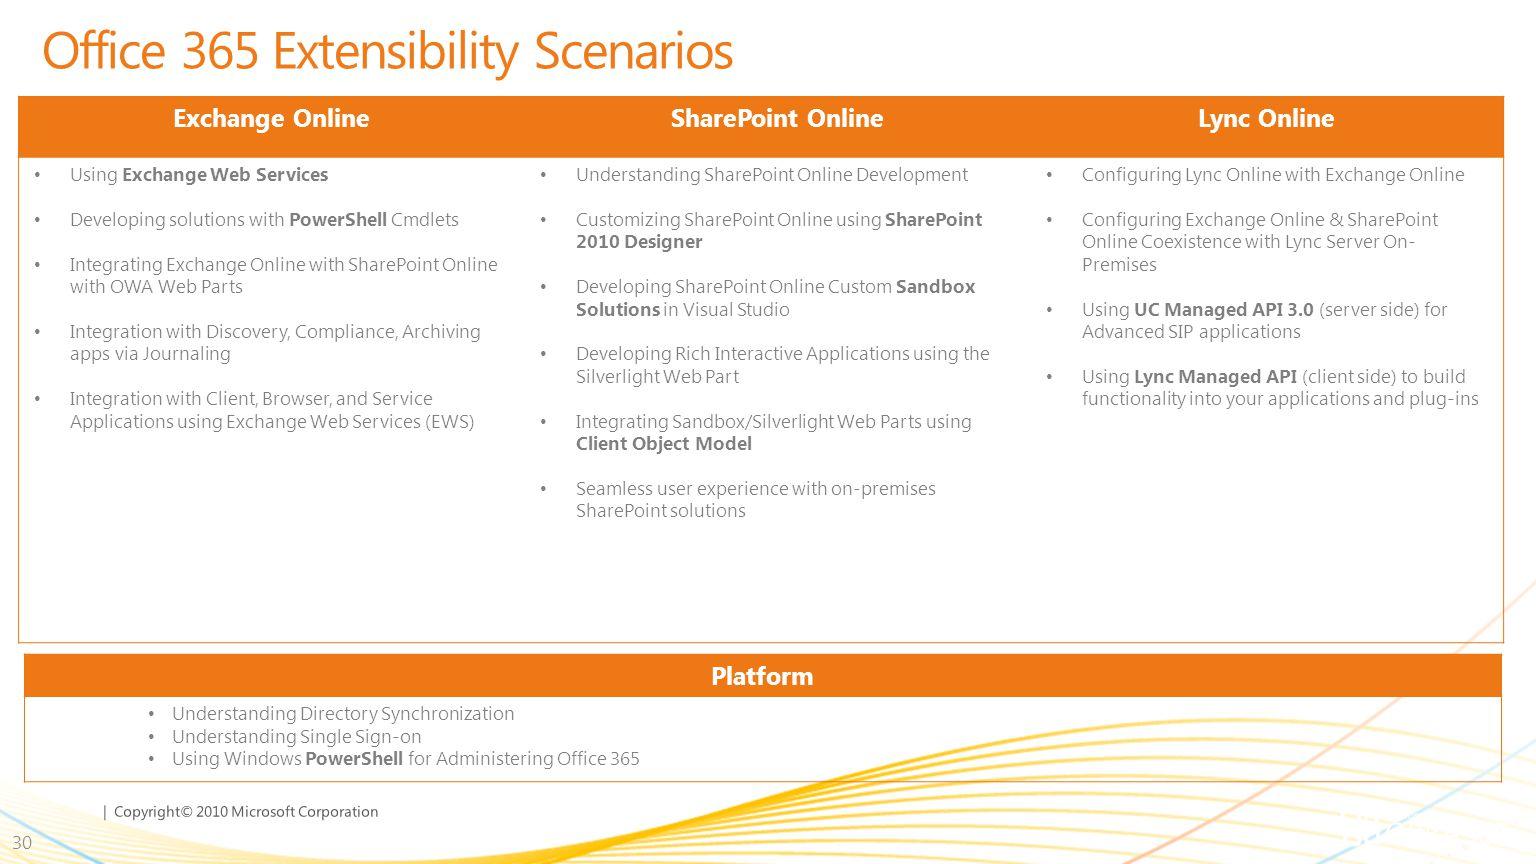 Office 365 Extensibility Scenarios